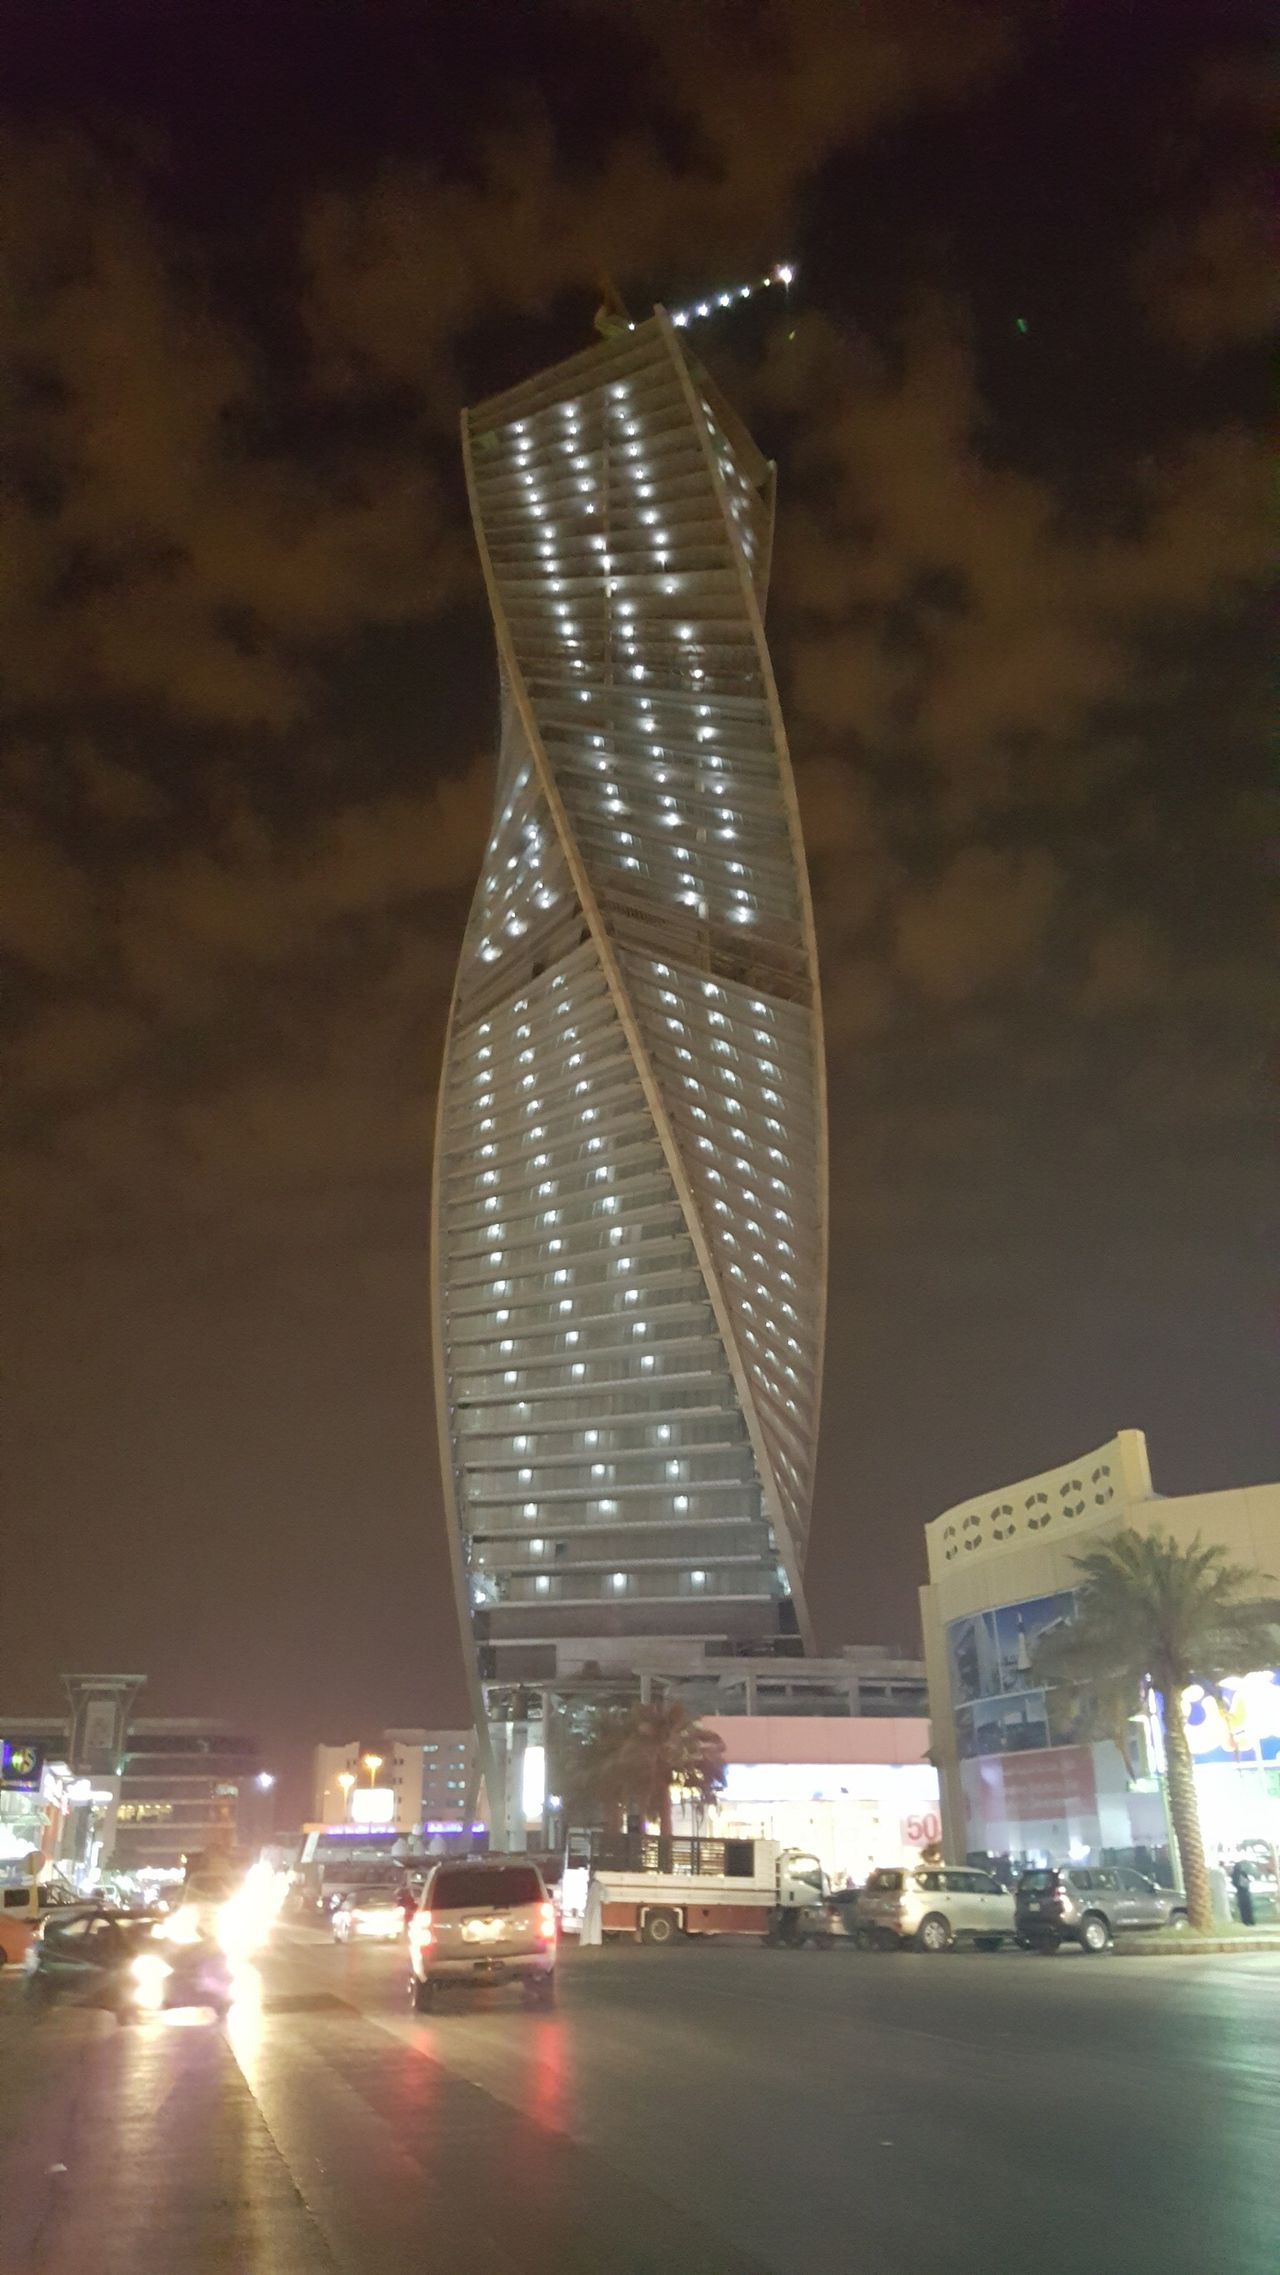 Construction Tower Architecture Riyadh City